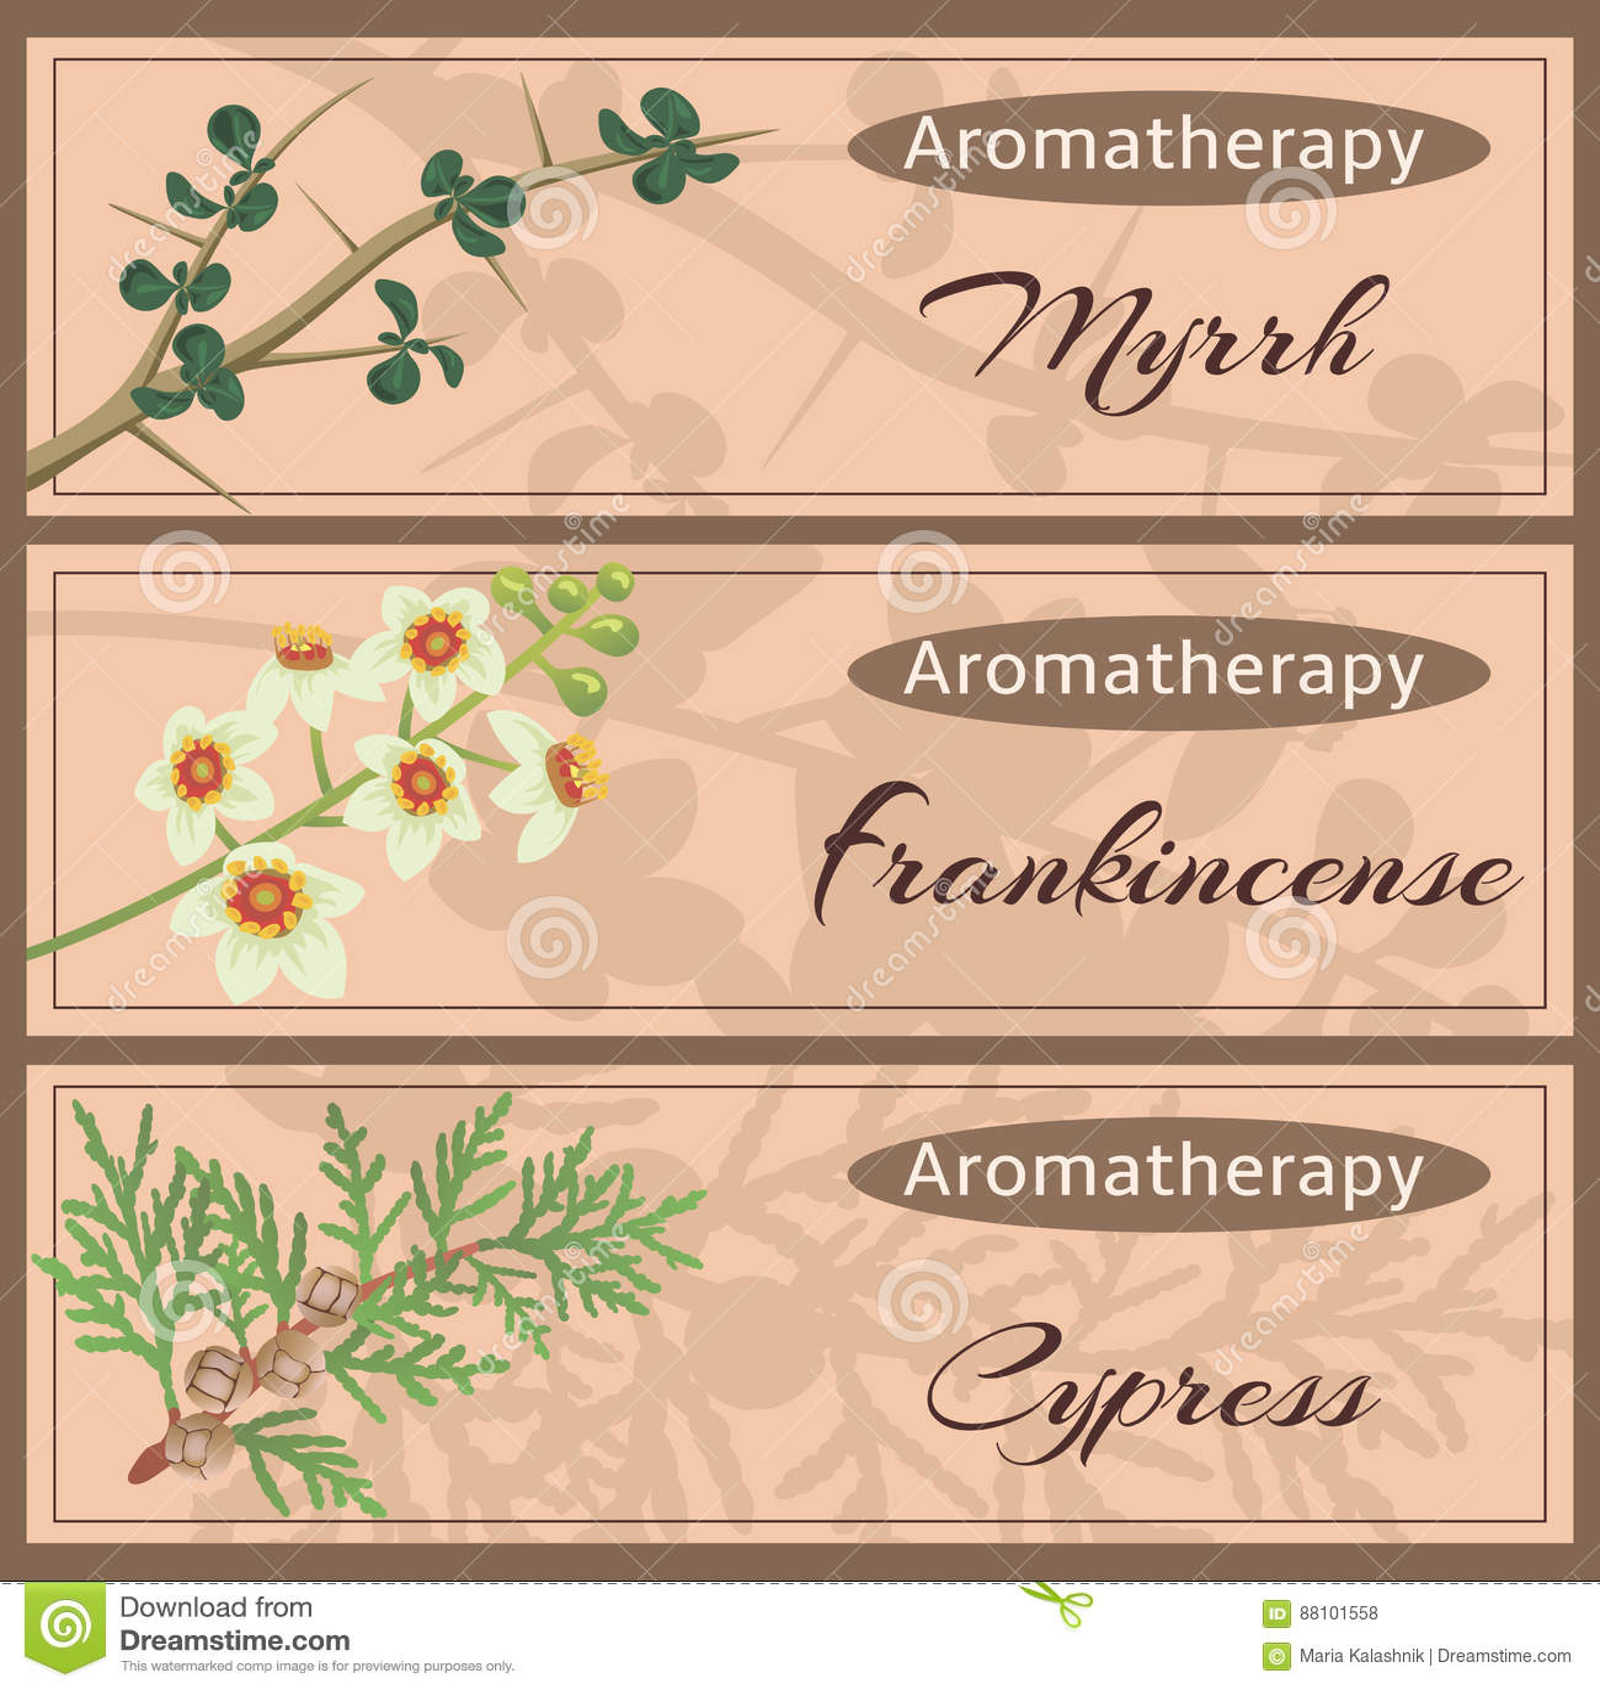 Aromatherapy vastgestelde inzameling